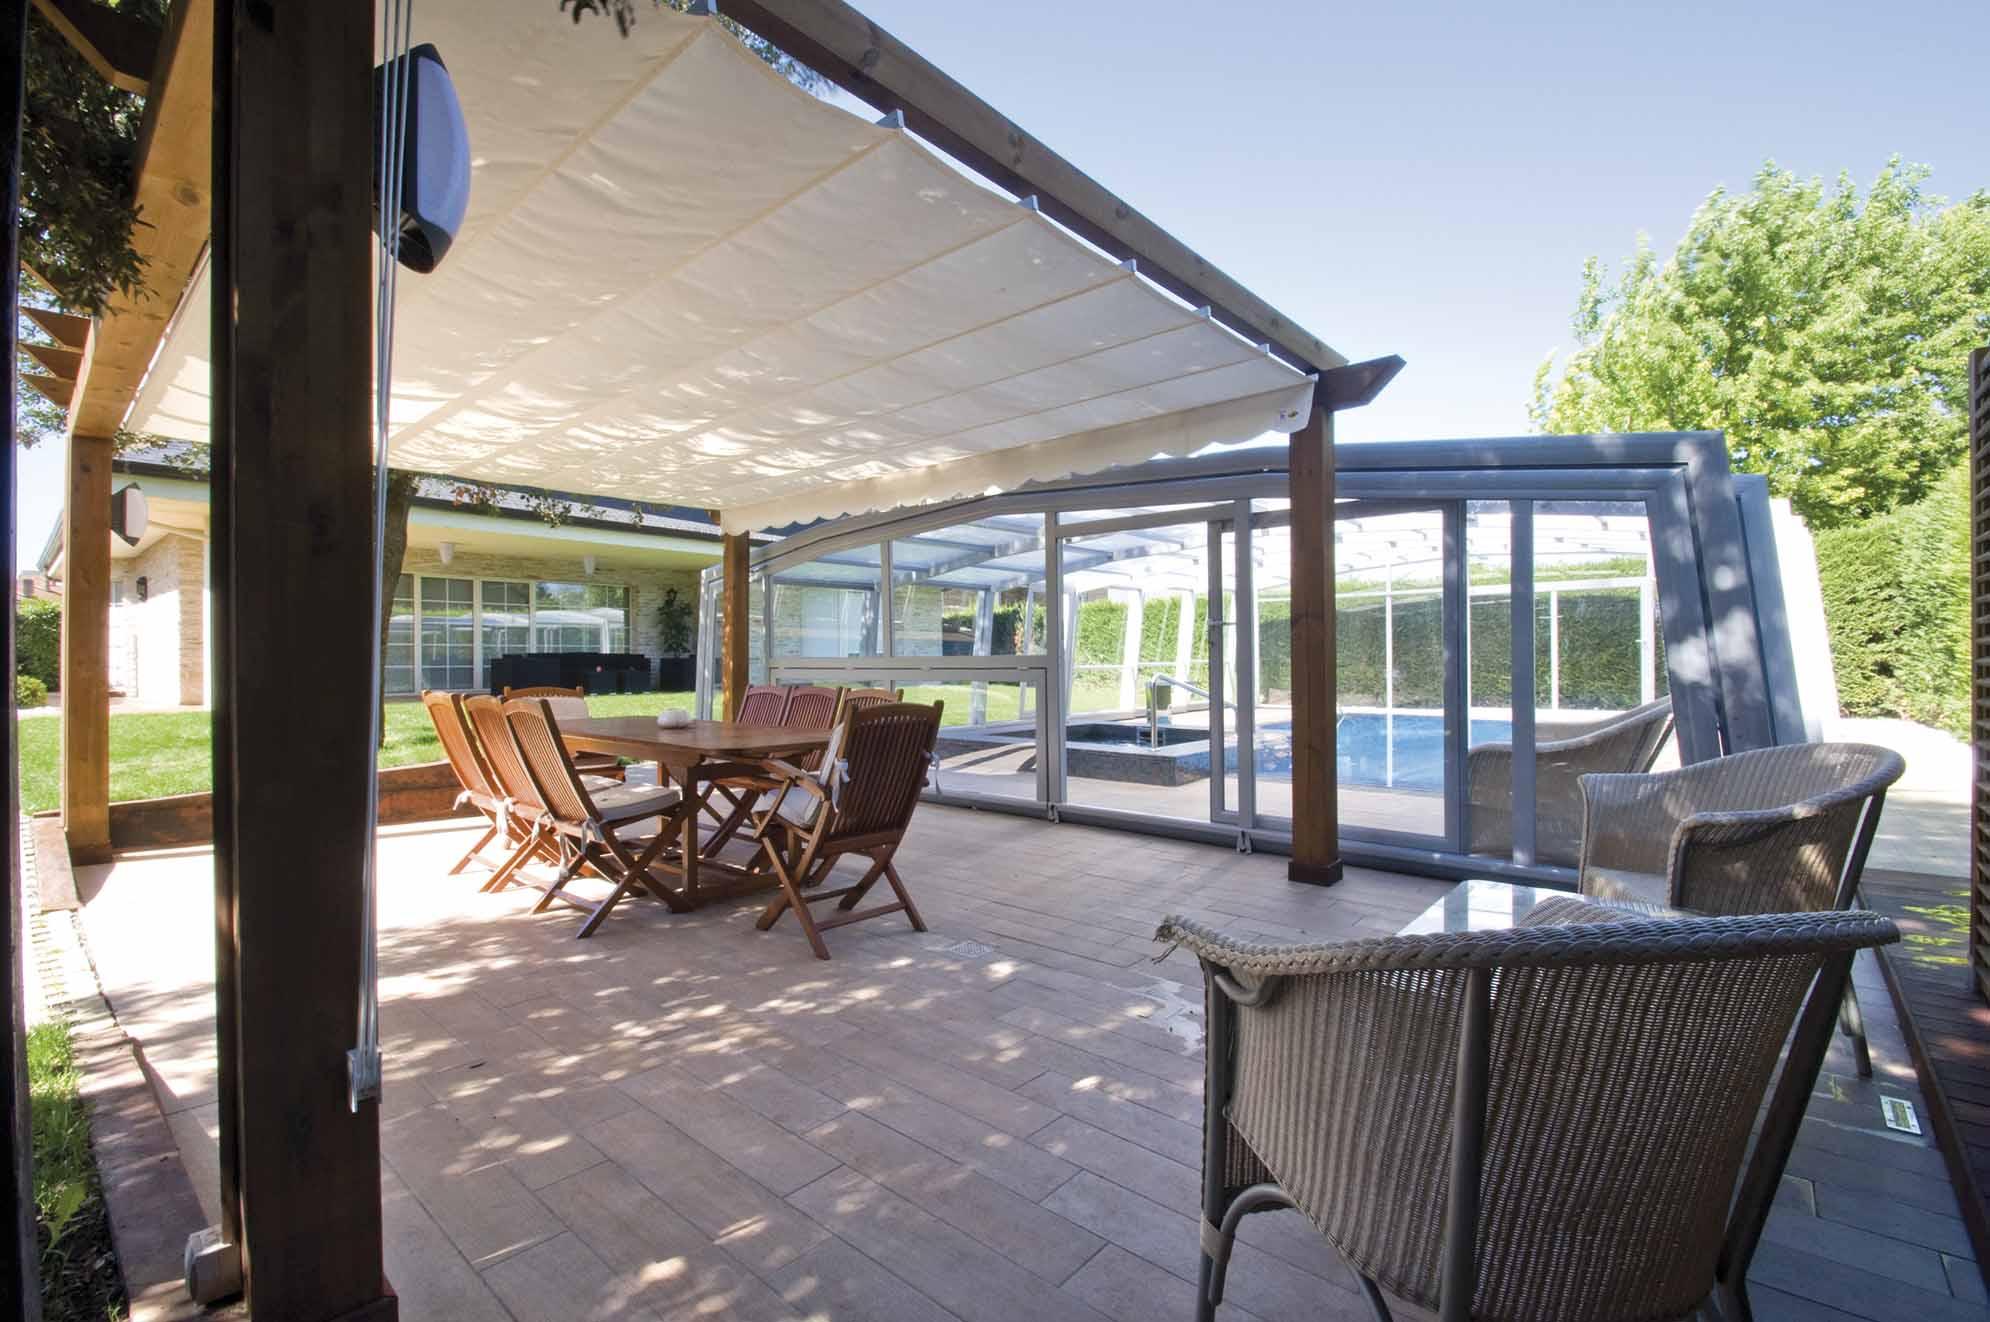 toldos-porche-jardin-exterior-7